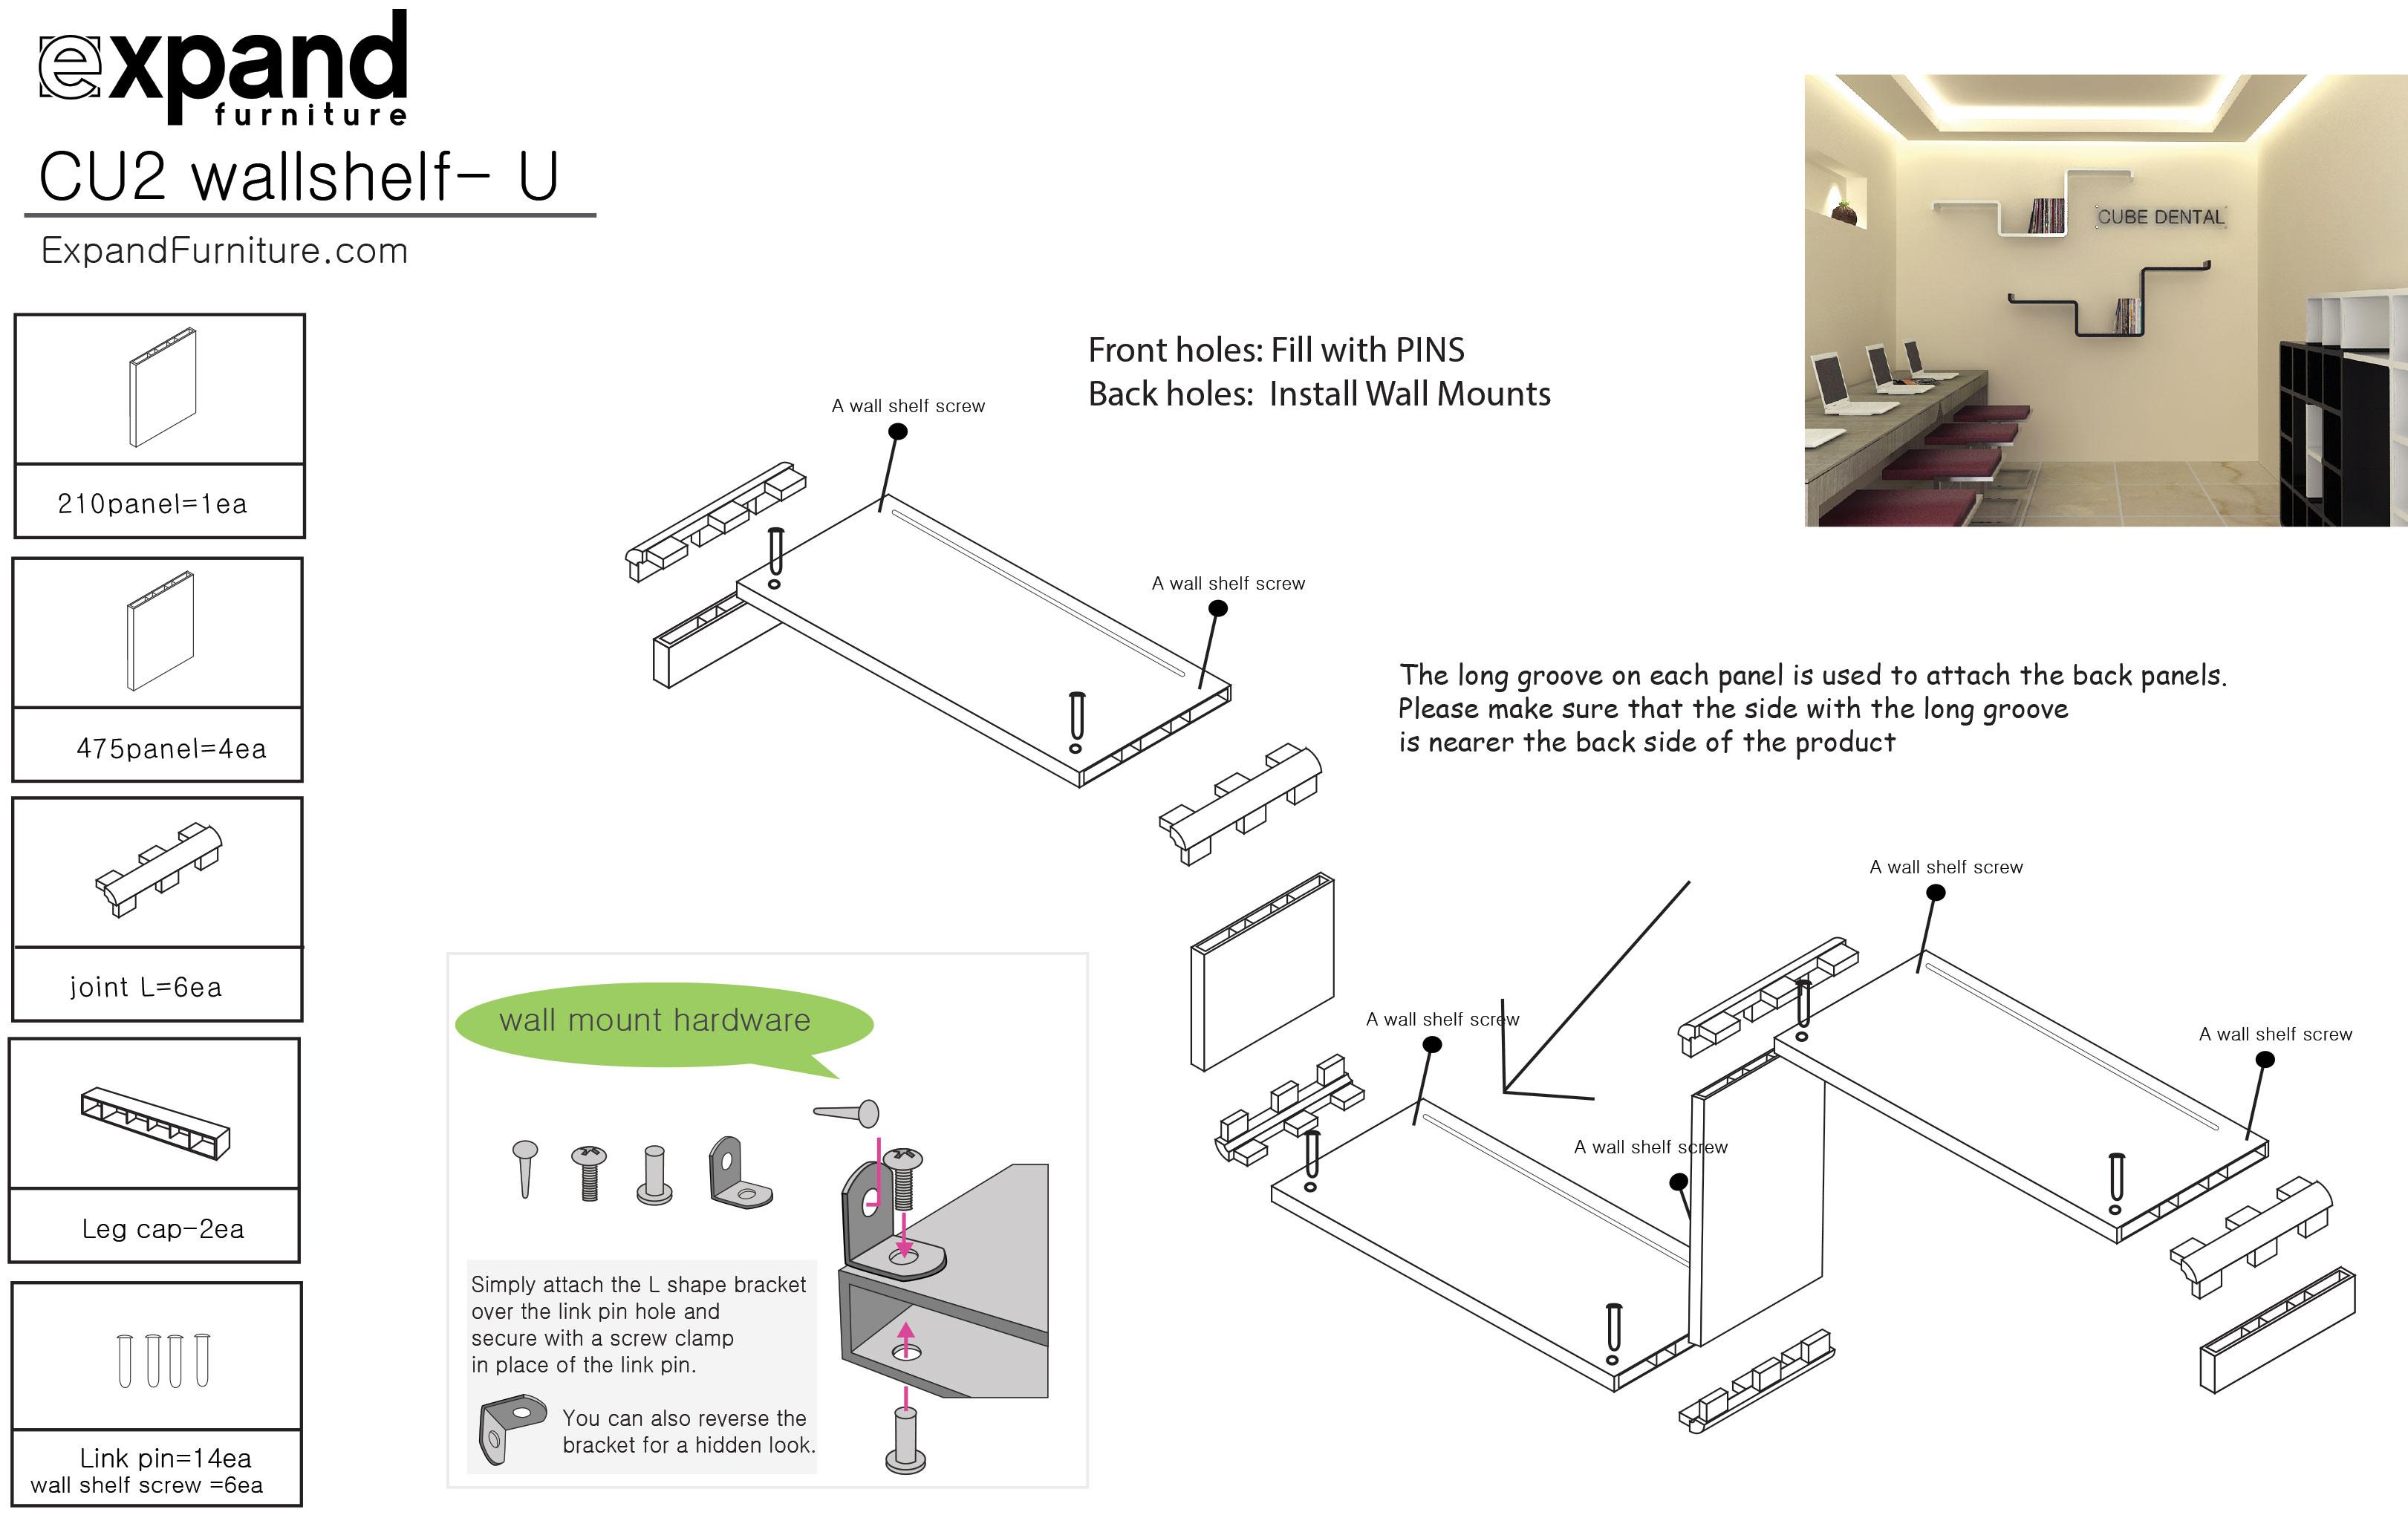 Modular shelf u expand furniture prev ccuart Images